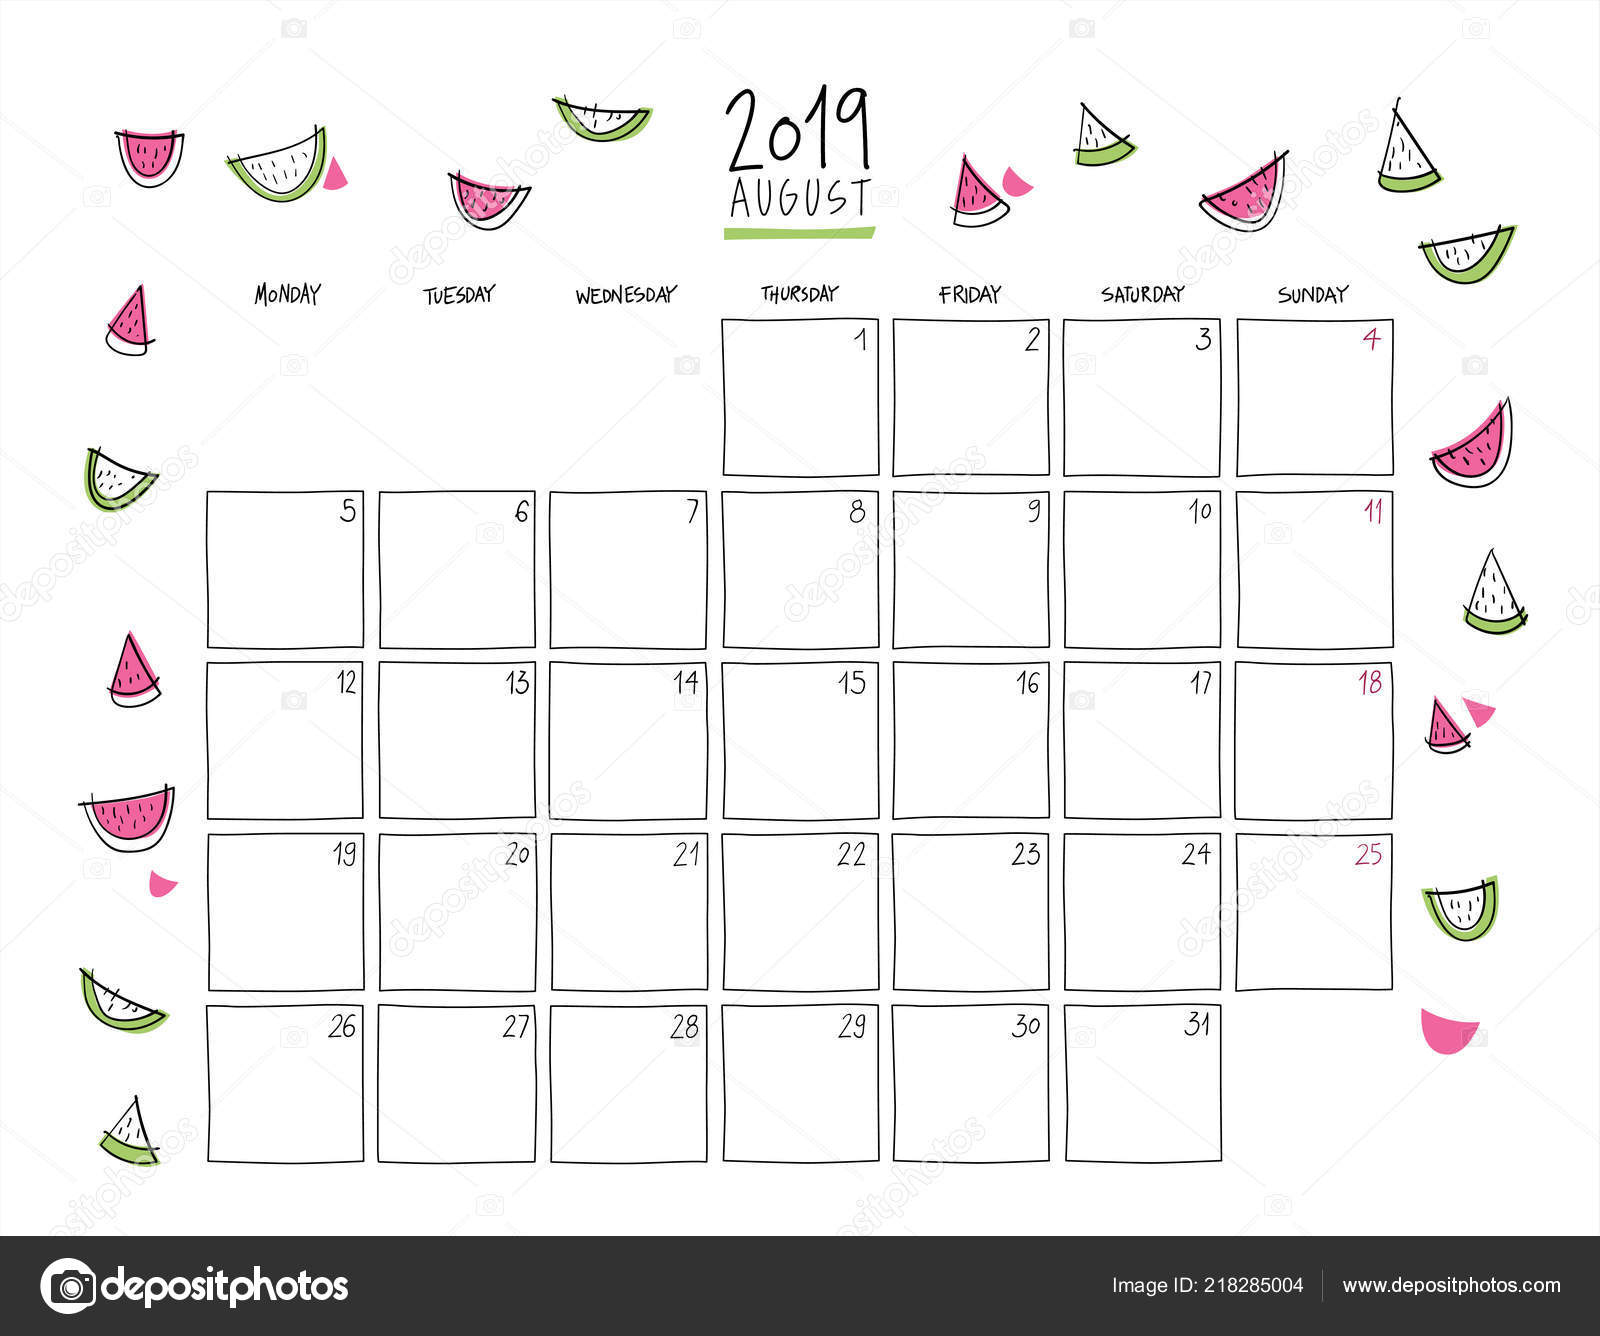 f7ca2f34d Calendario de pared de agosto de 2019. Plantilla horizontal de dibujo  colorido.